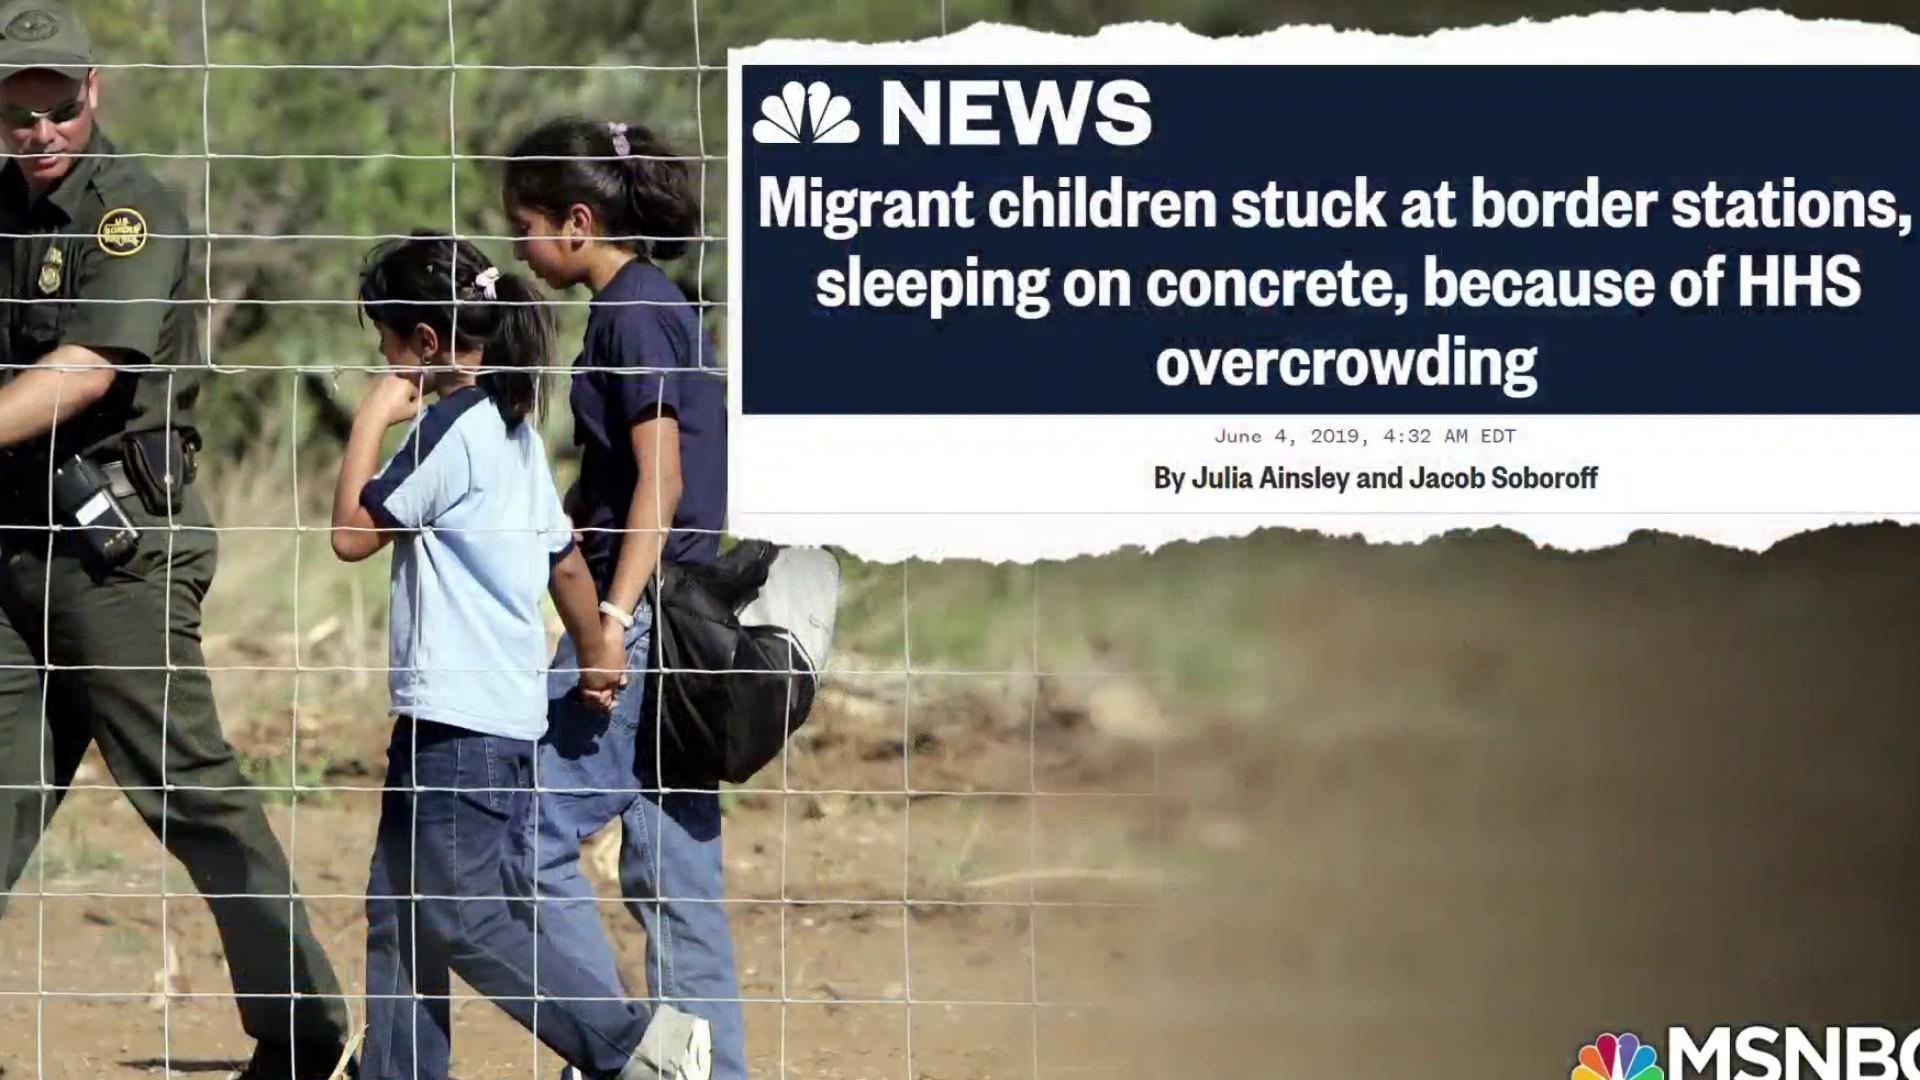 Rep. DeGette demands private prisons housing migrants be shut down